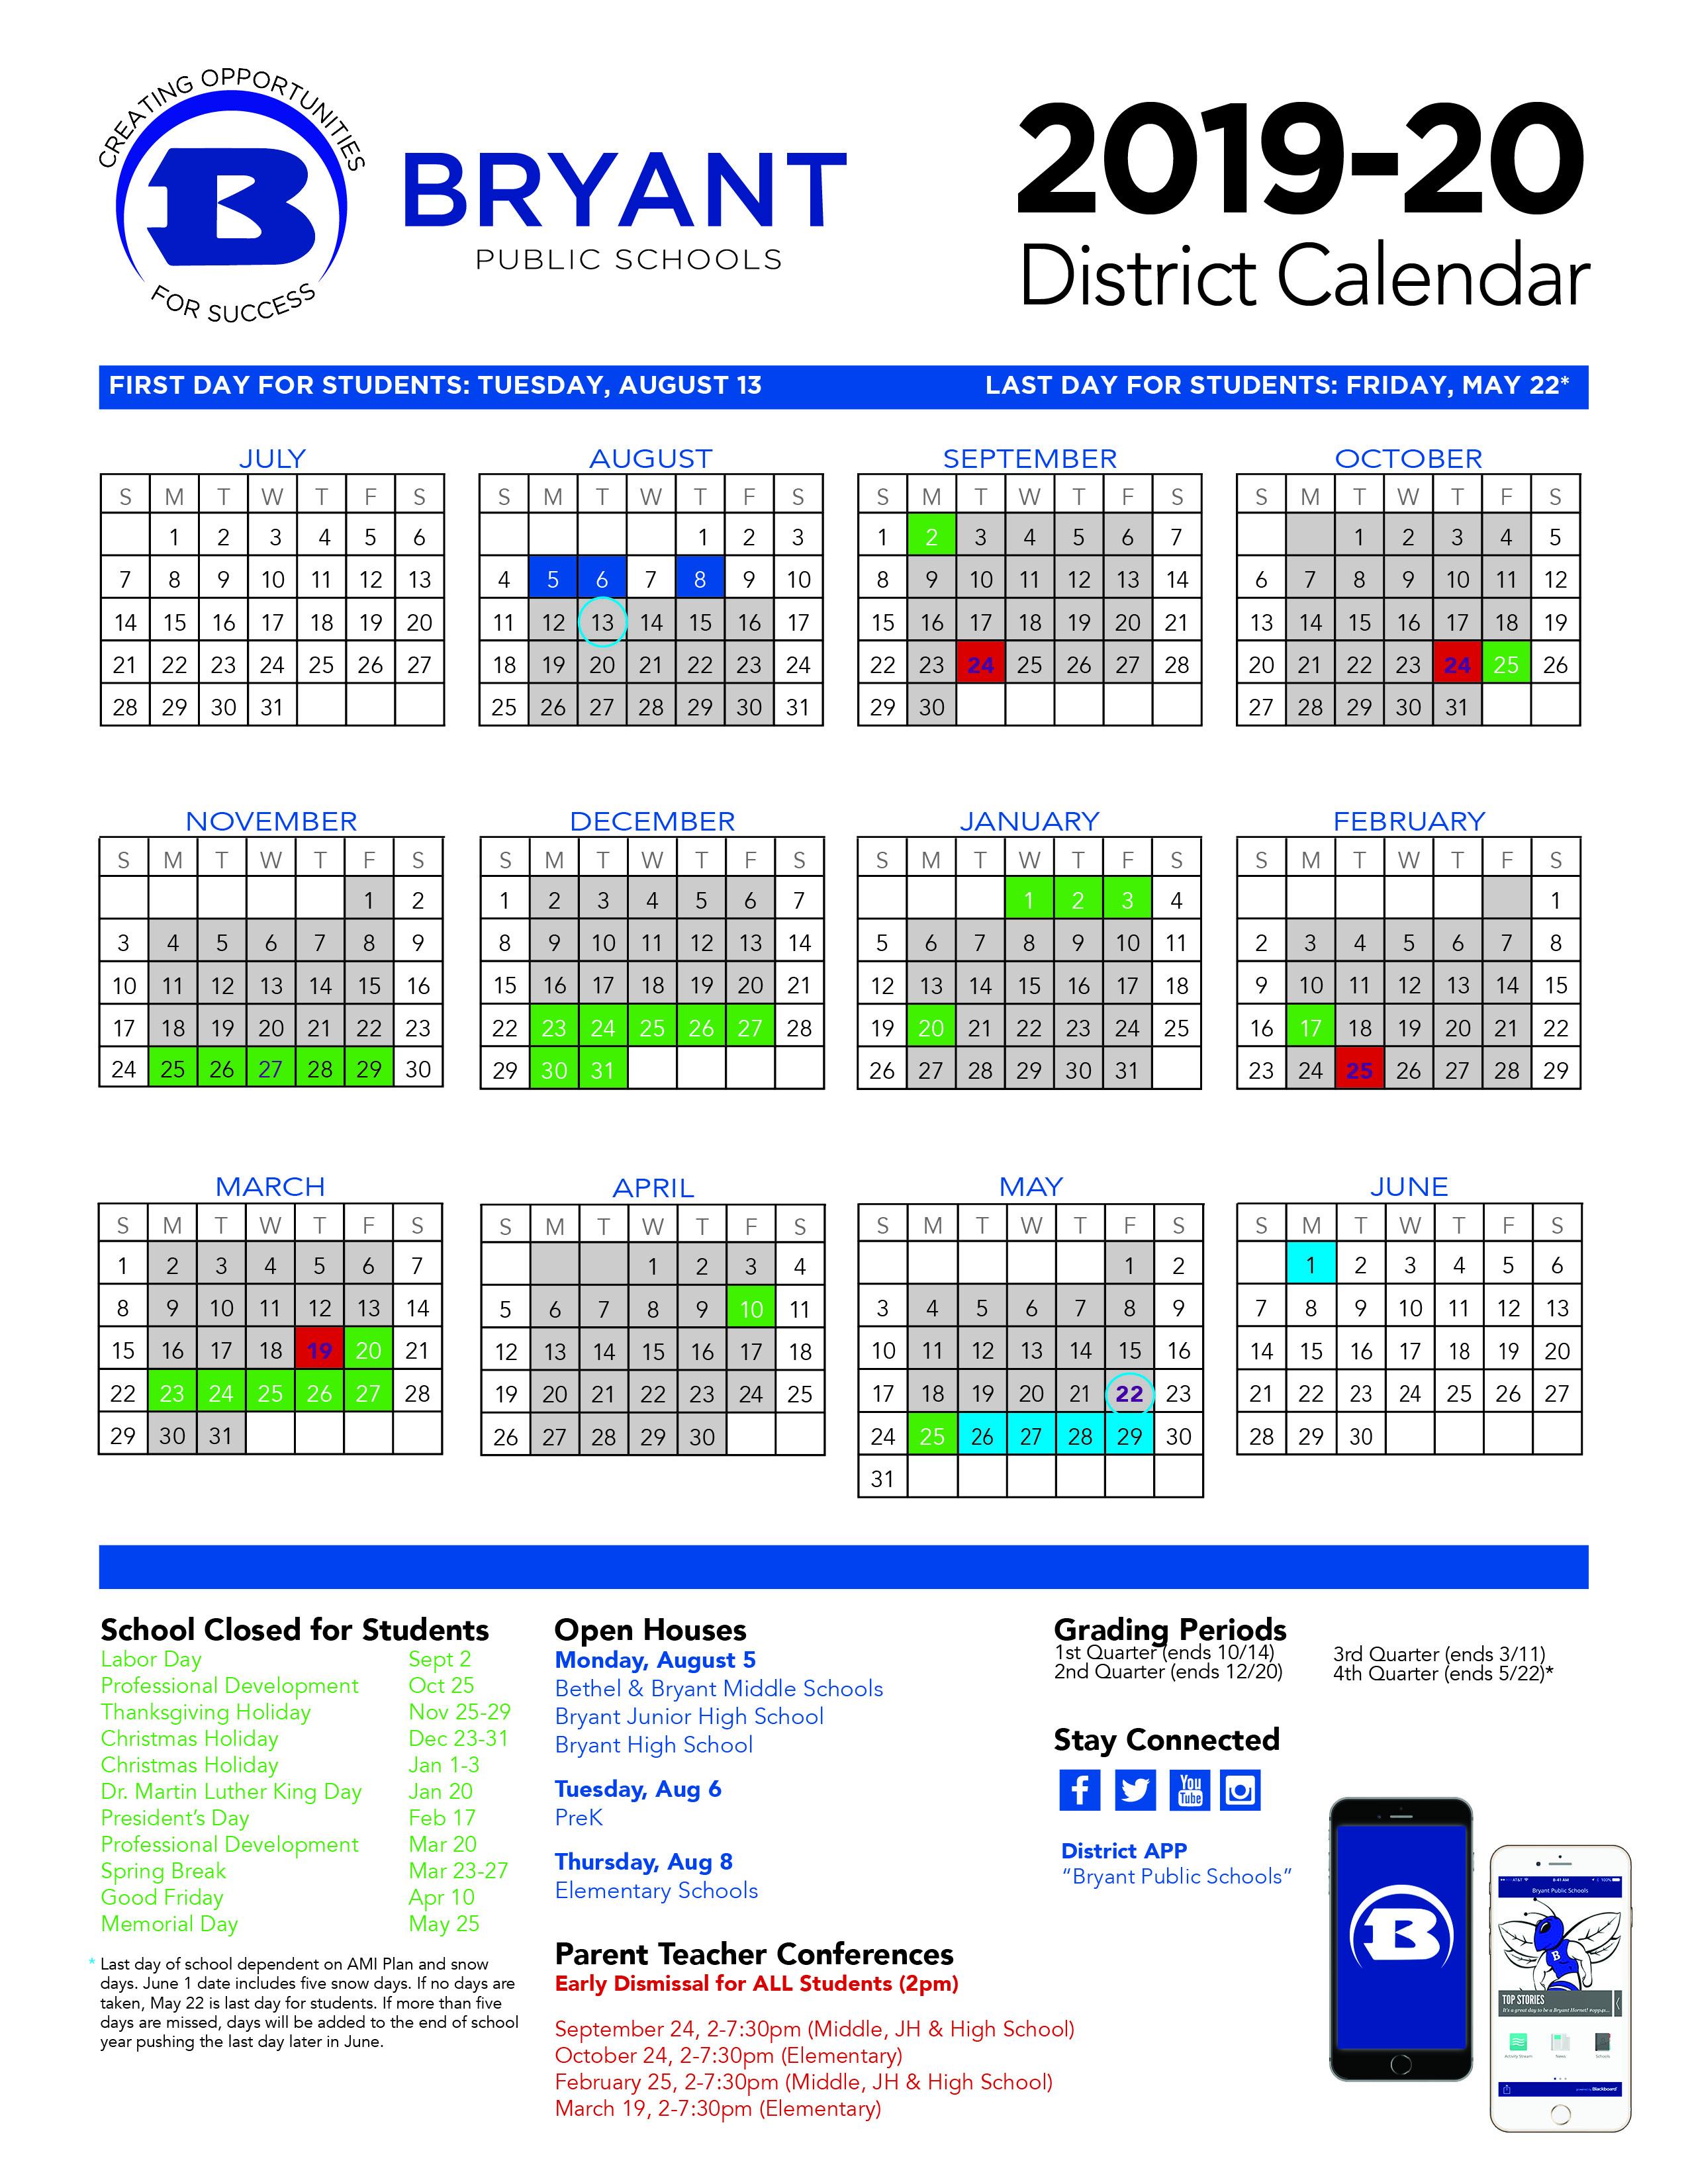 Success Happens Here January 2019 – Bryant Public Schools For Pine Bluff School District Calendar